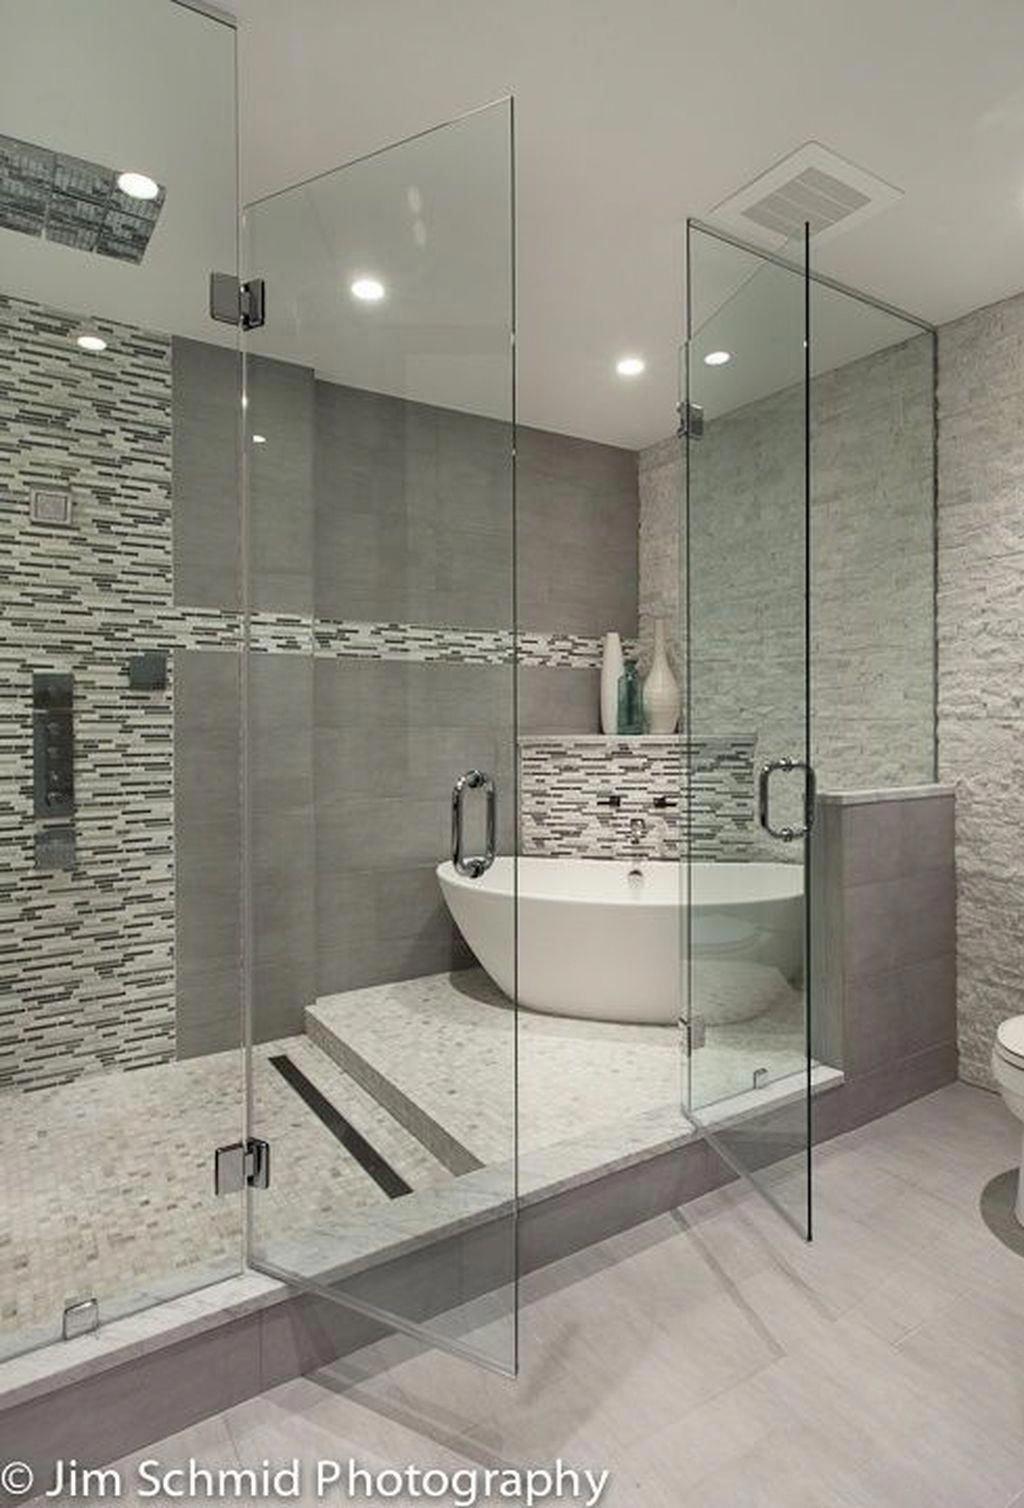 Stunning 30 Best Master Bathroom Shower Remodel Ideas To Try Bathroom Ideas Bathroomd Master Bathroom Design Bathroom Remodel Master Master Bathroom Shower